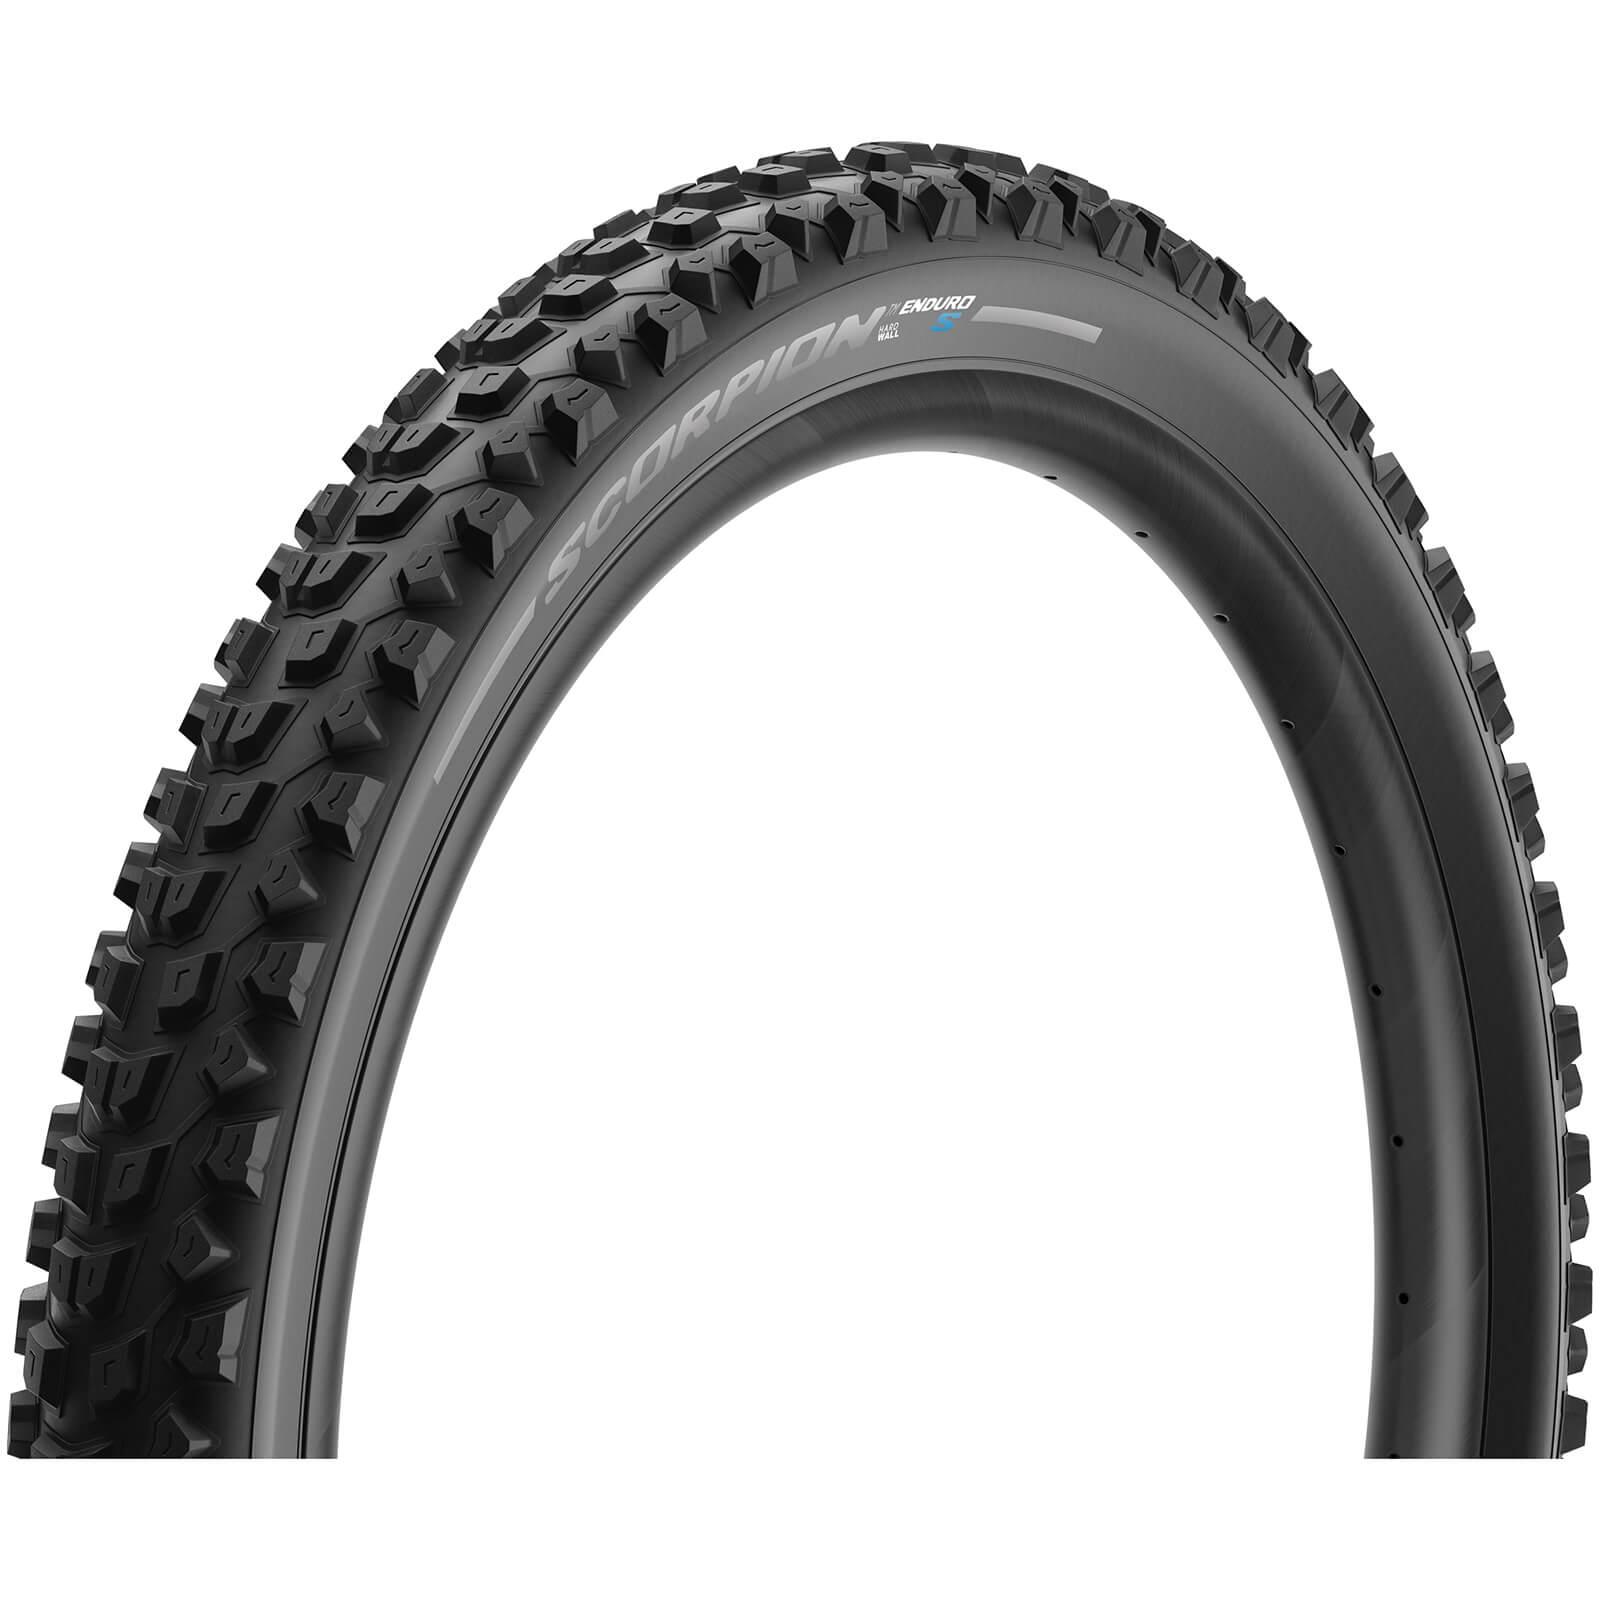 Pirelli Scorpion™ Enduro S MTB Tyre - 2.6In